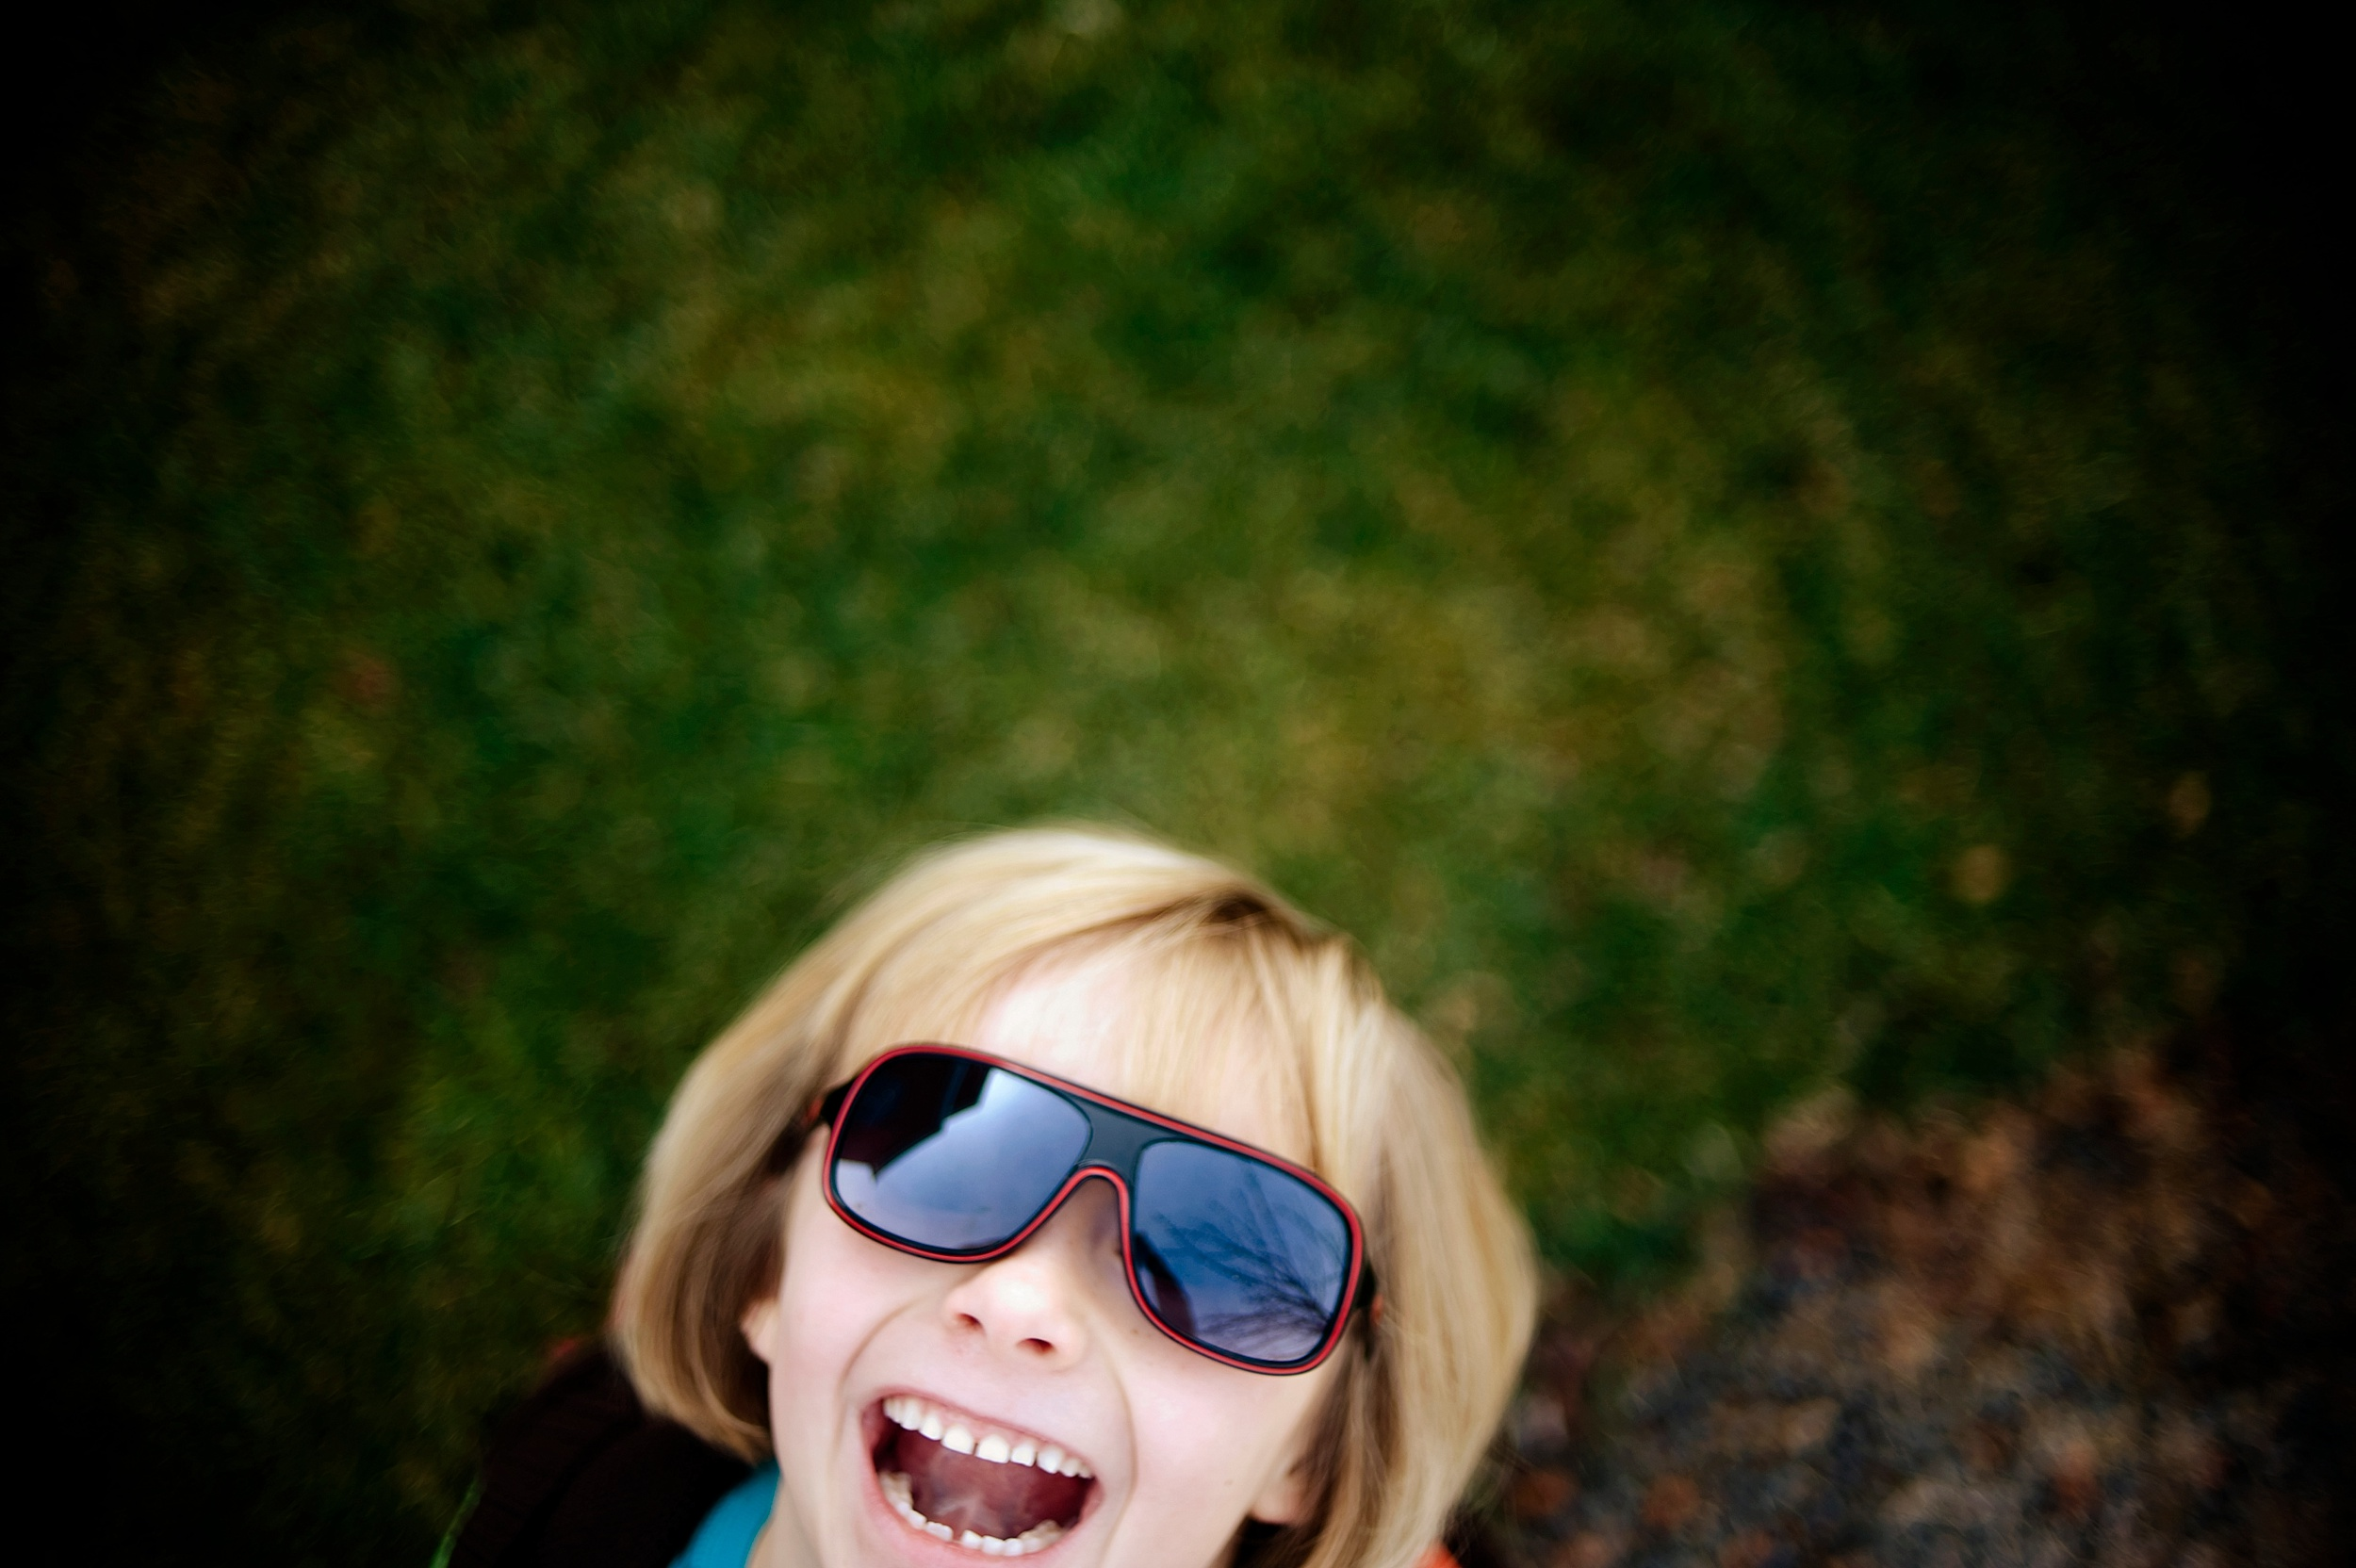 21-laughing-girl-photo.jpg